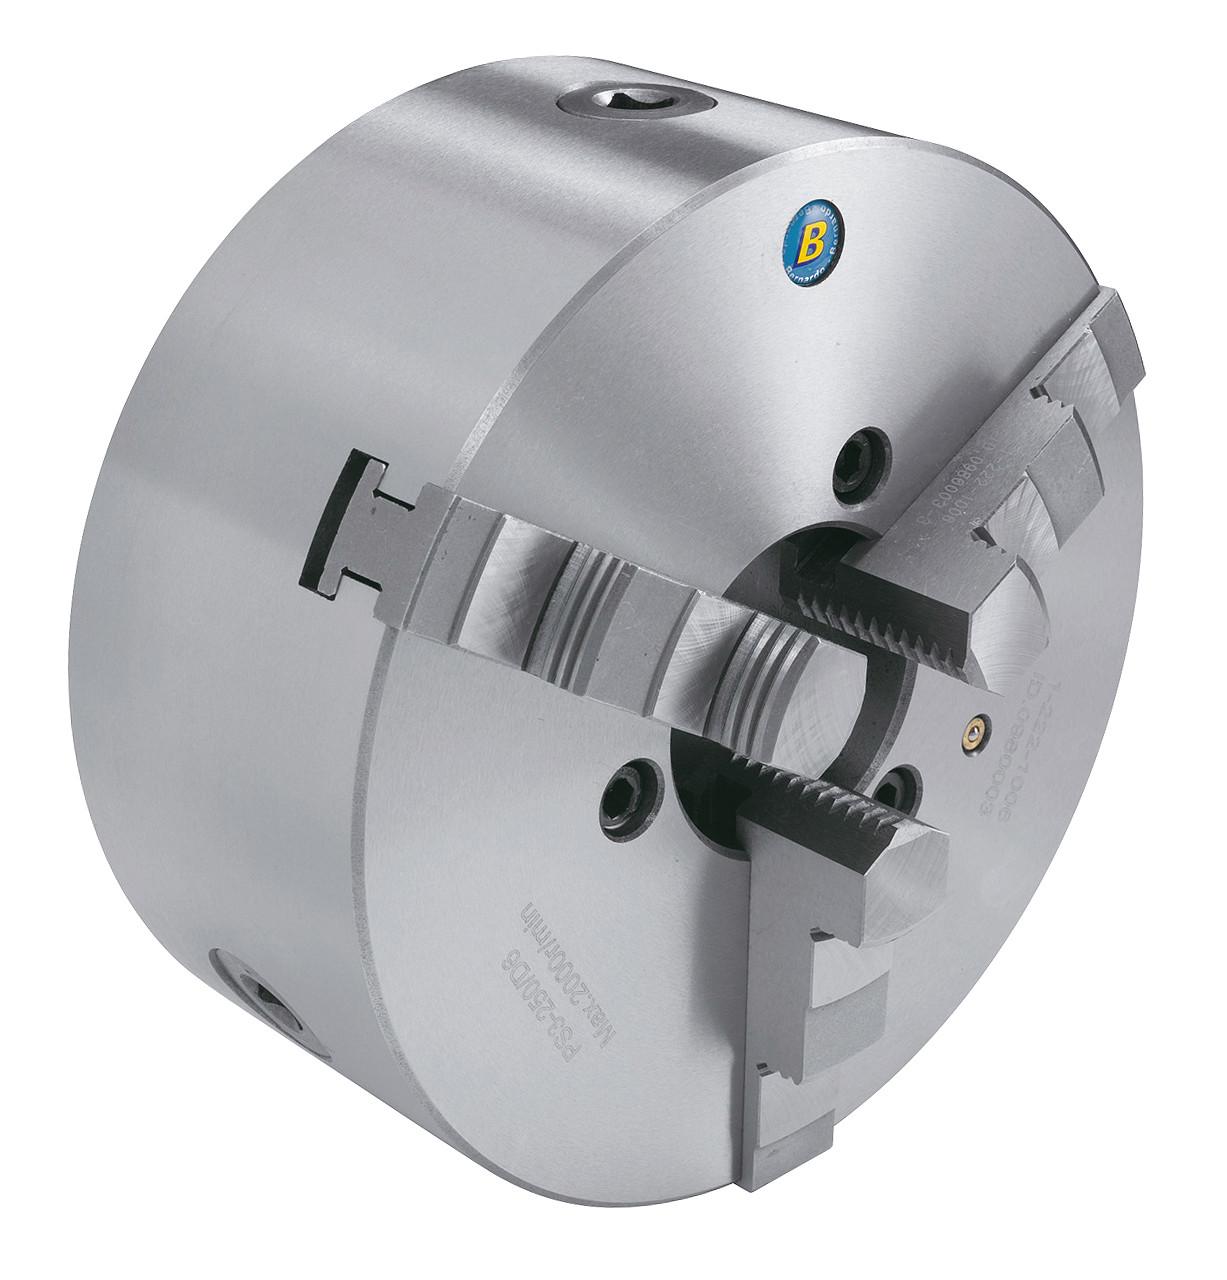 Стандартный 3-челюстный патрон PS3-160/D5